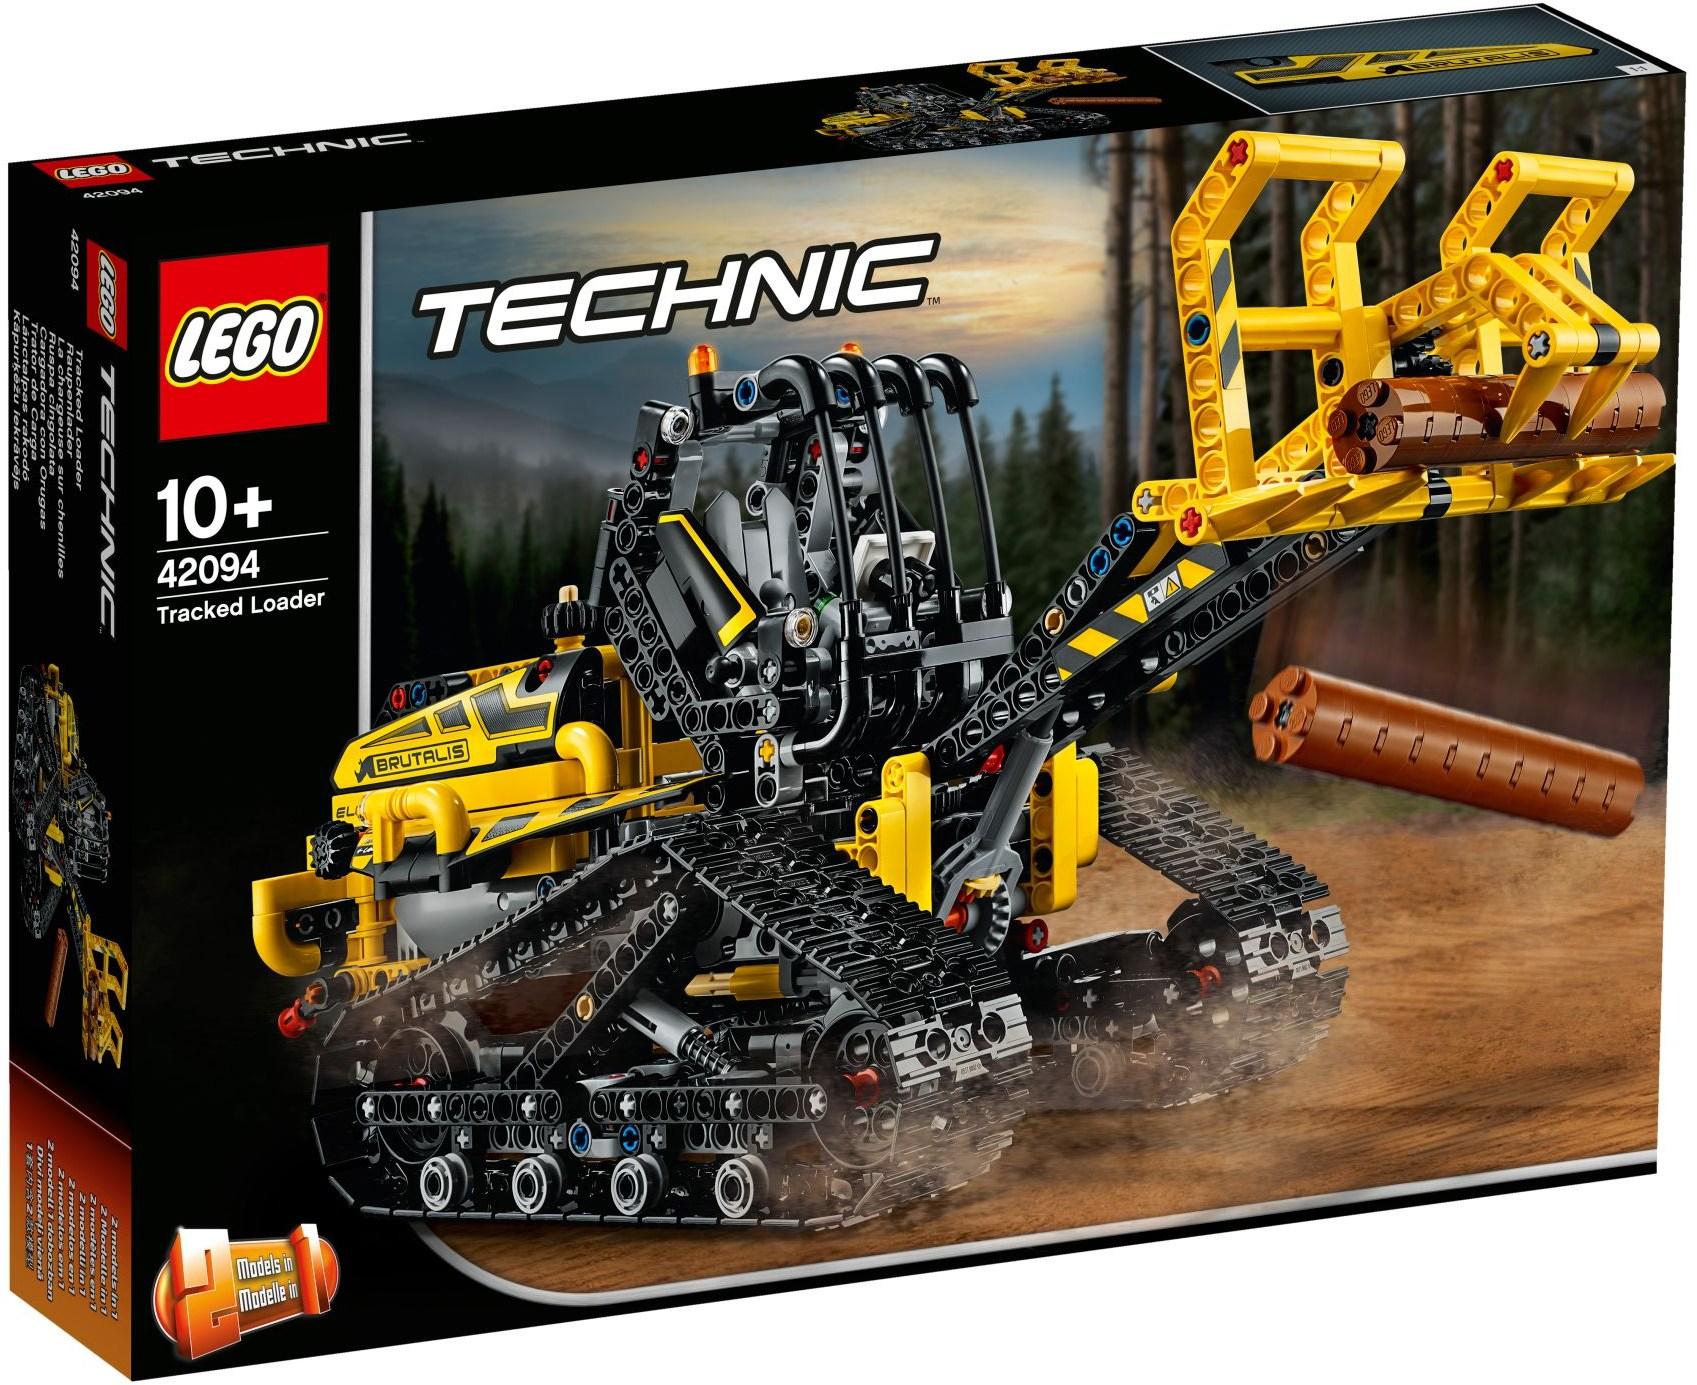 LEGO TRACKED LOADER - 42094